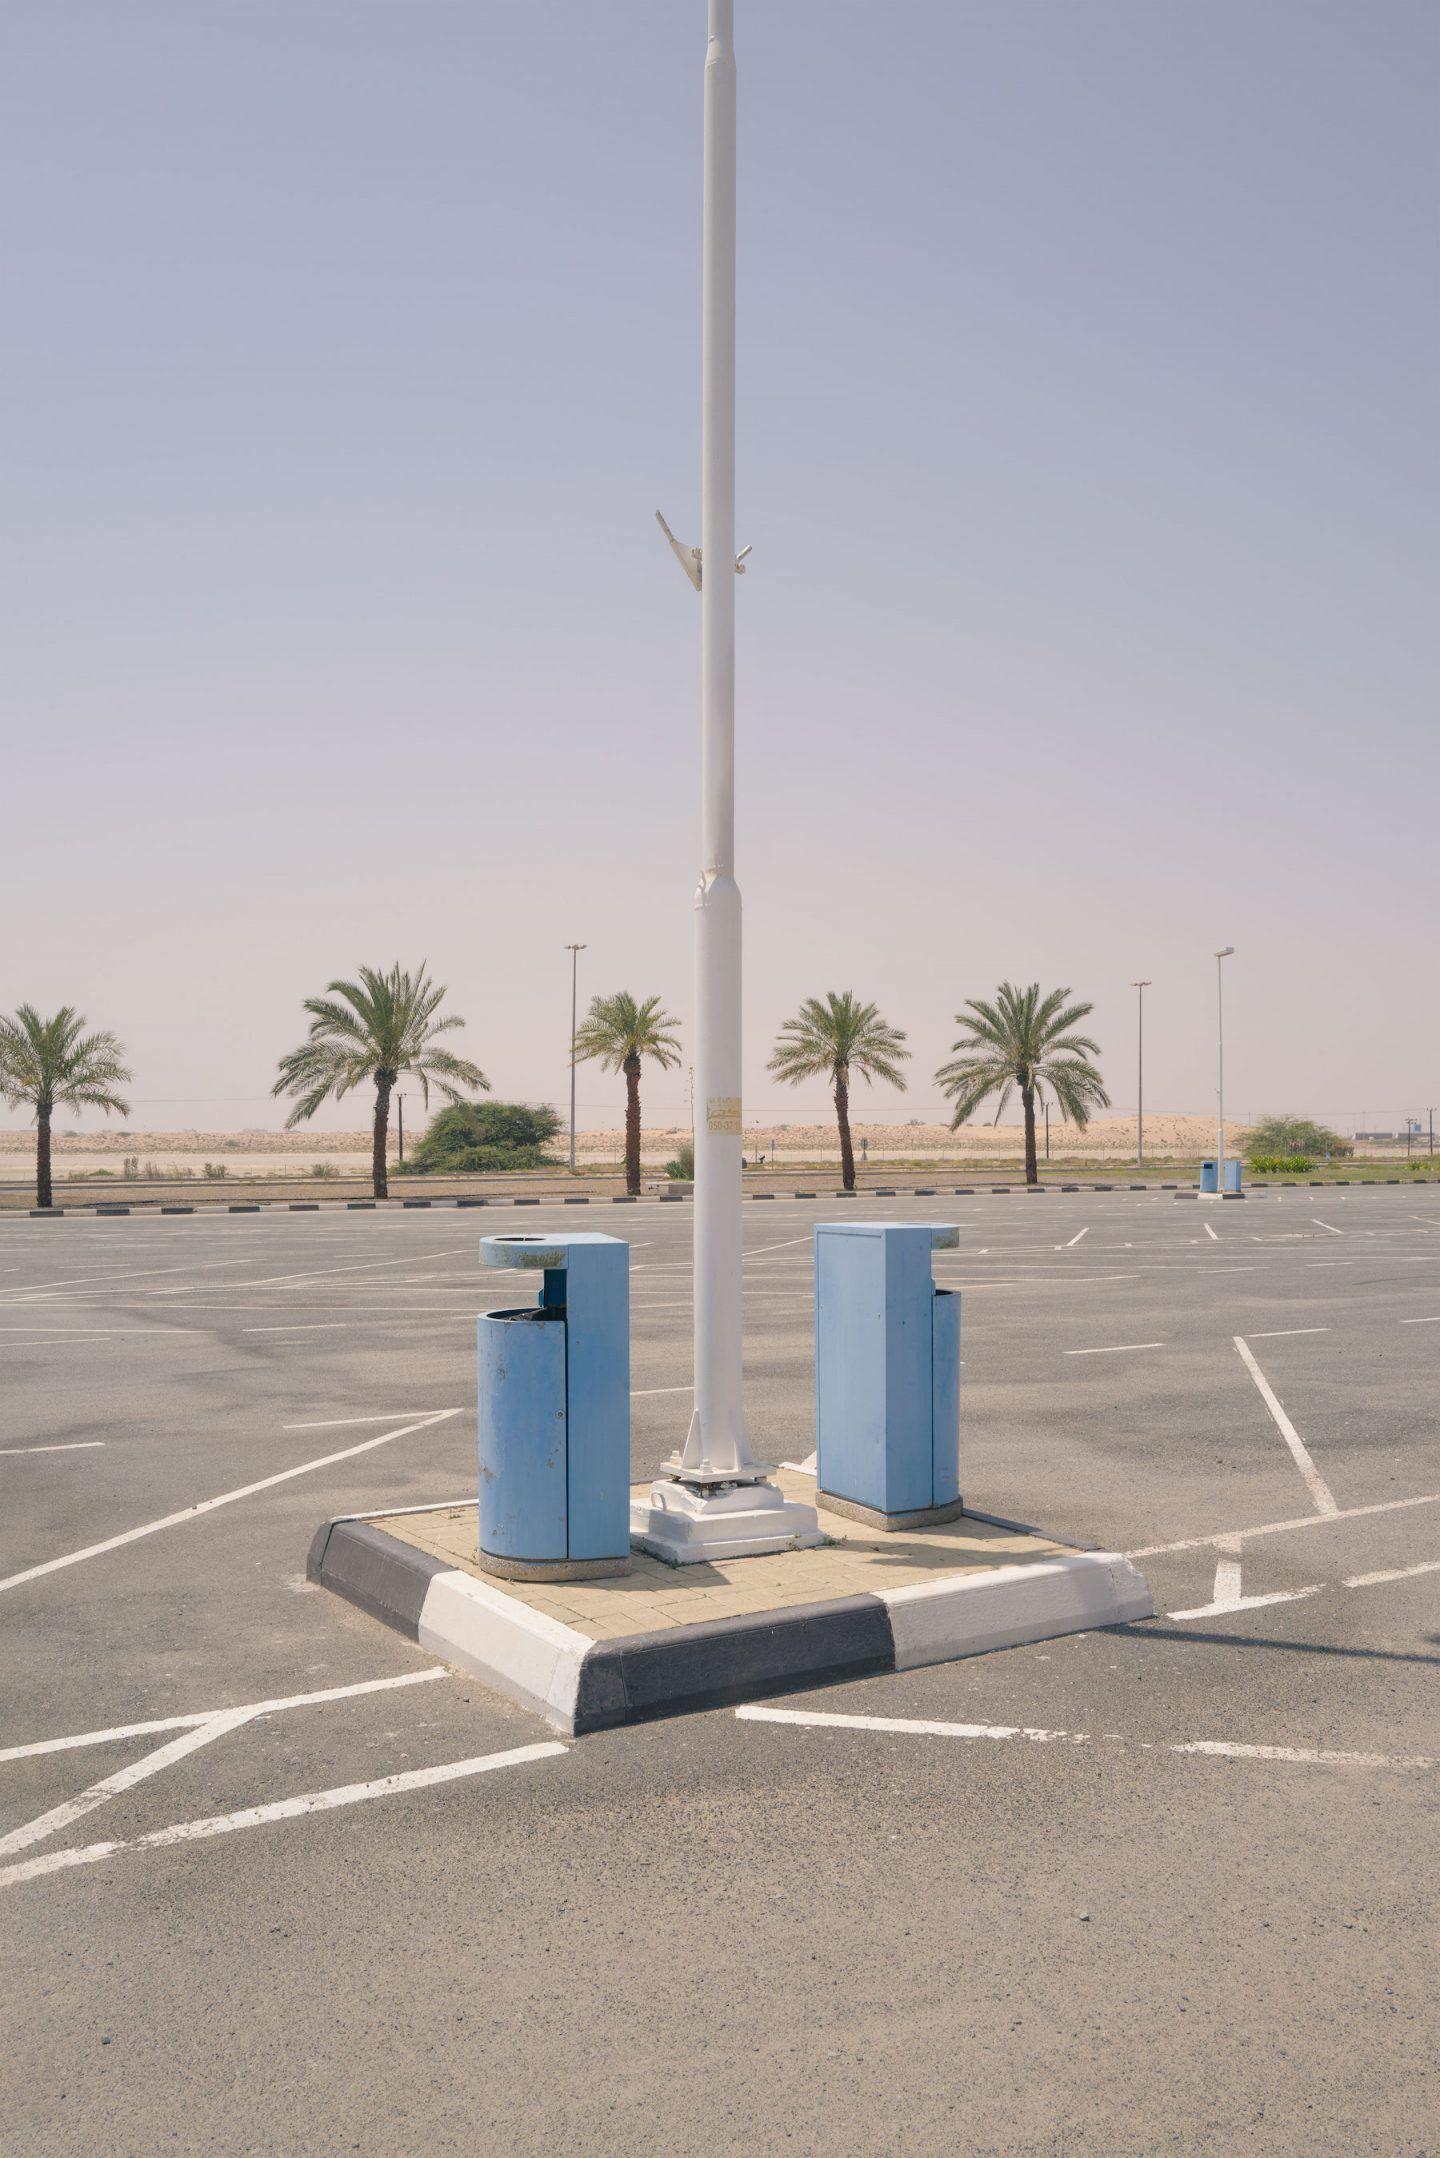 IGNANT-Photography-Gonzalo-Palavecino-Old-Dubai-020